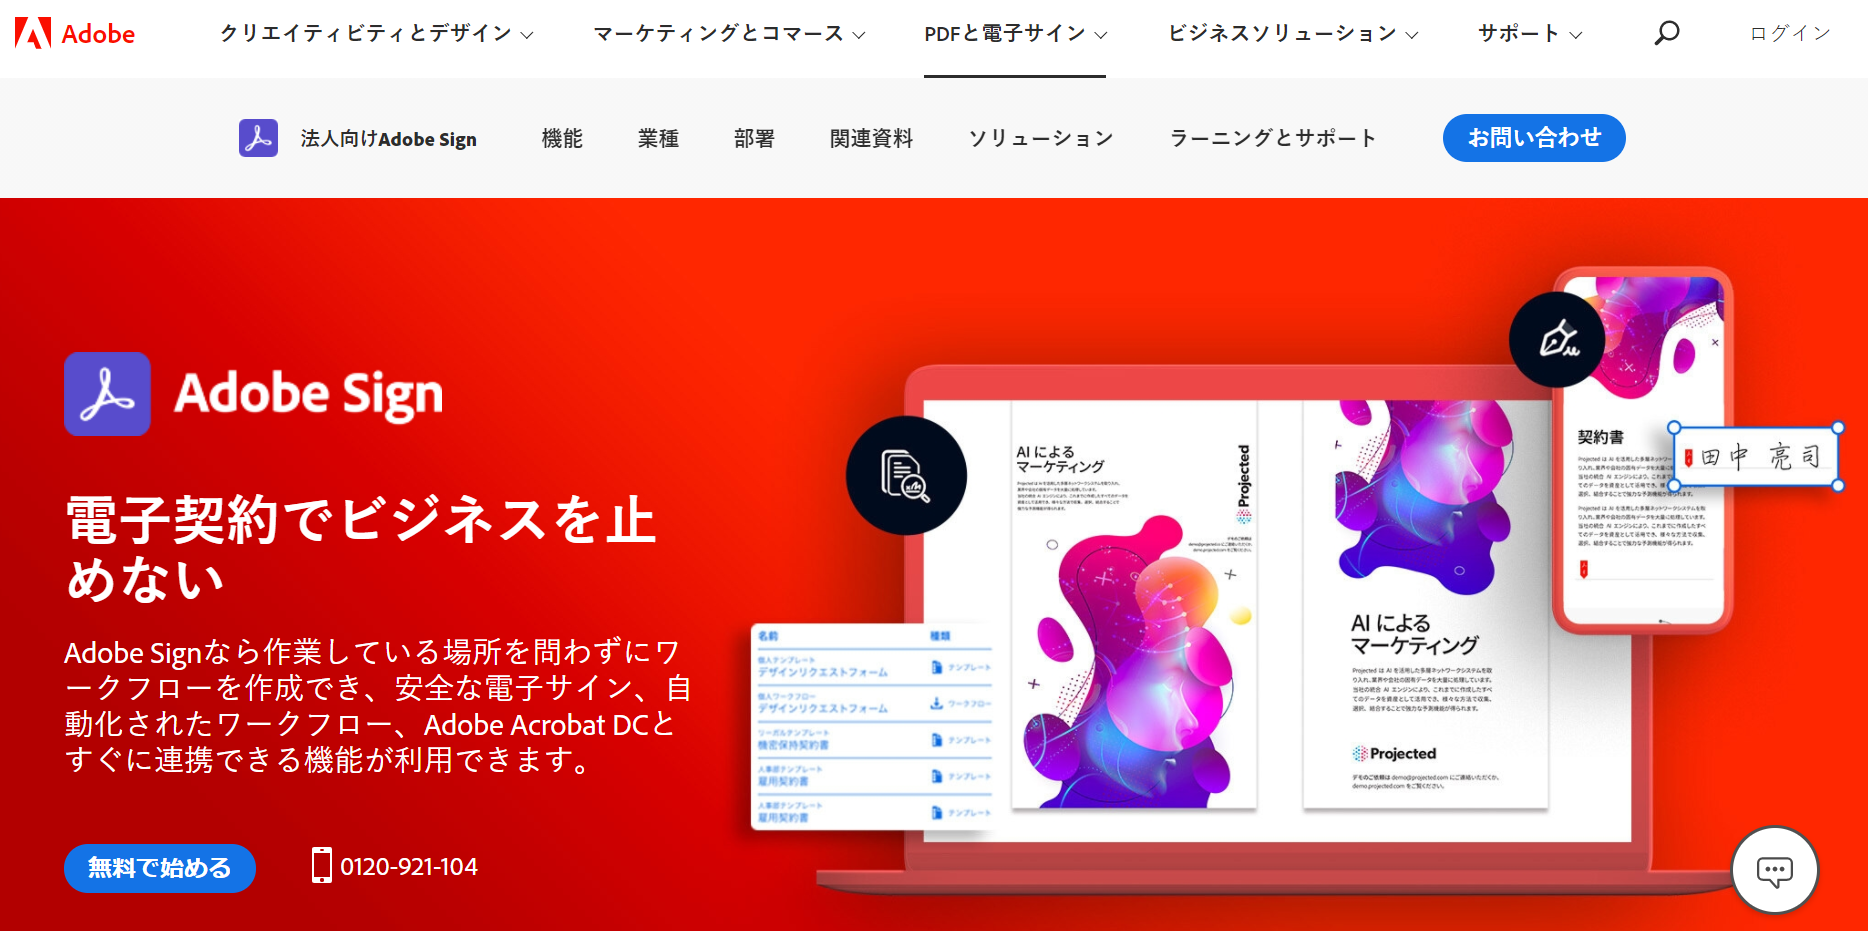 Adobe Sign 公式Webサイト